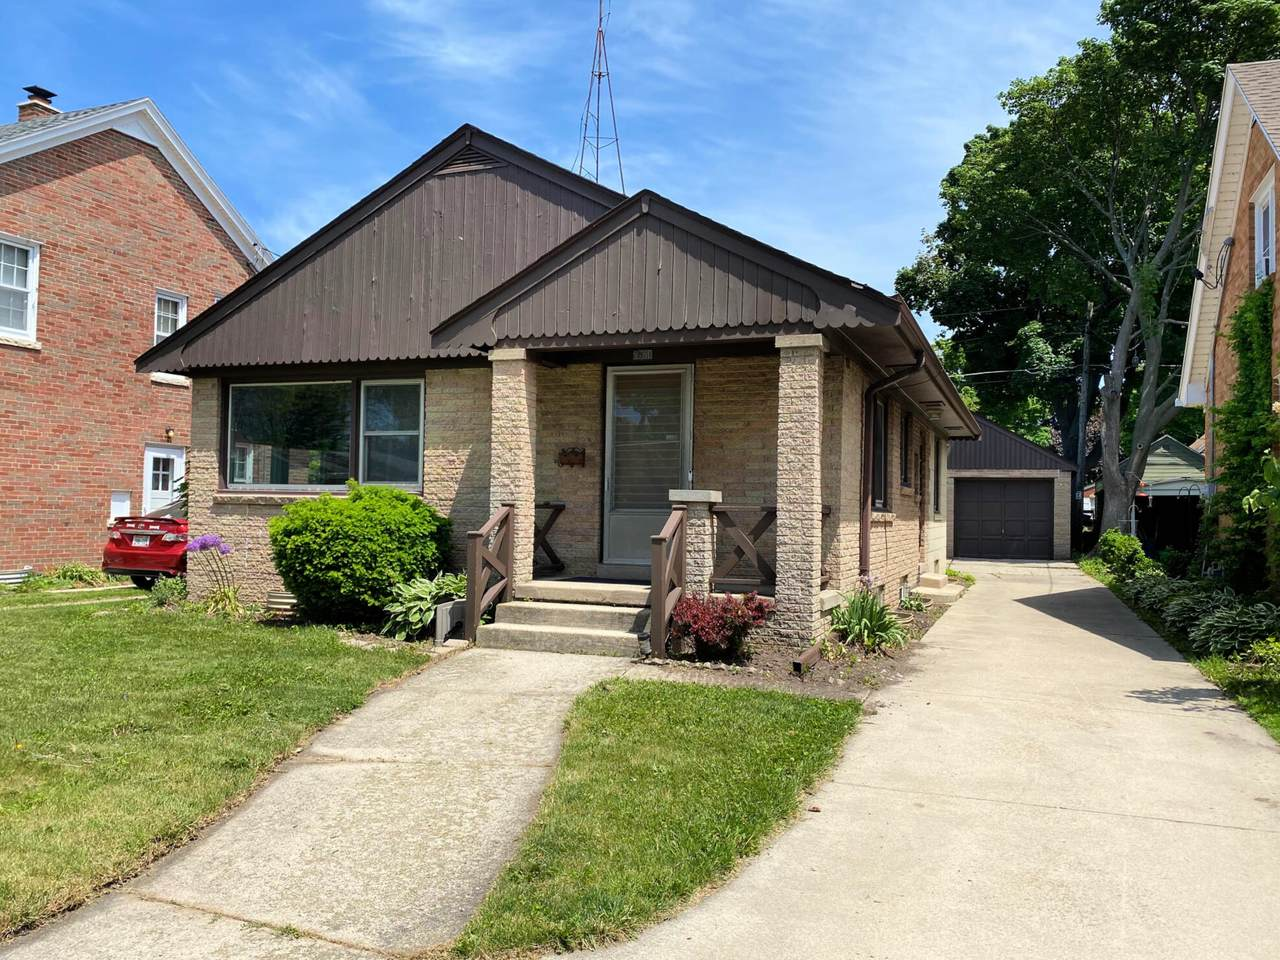 2821 Erie St - Photo 1